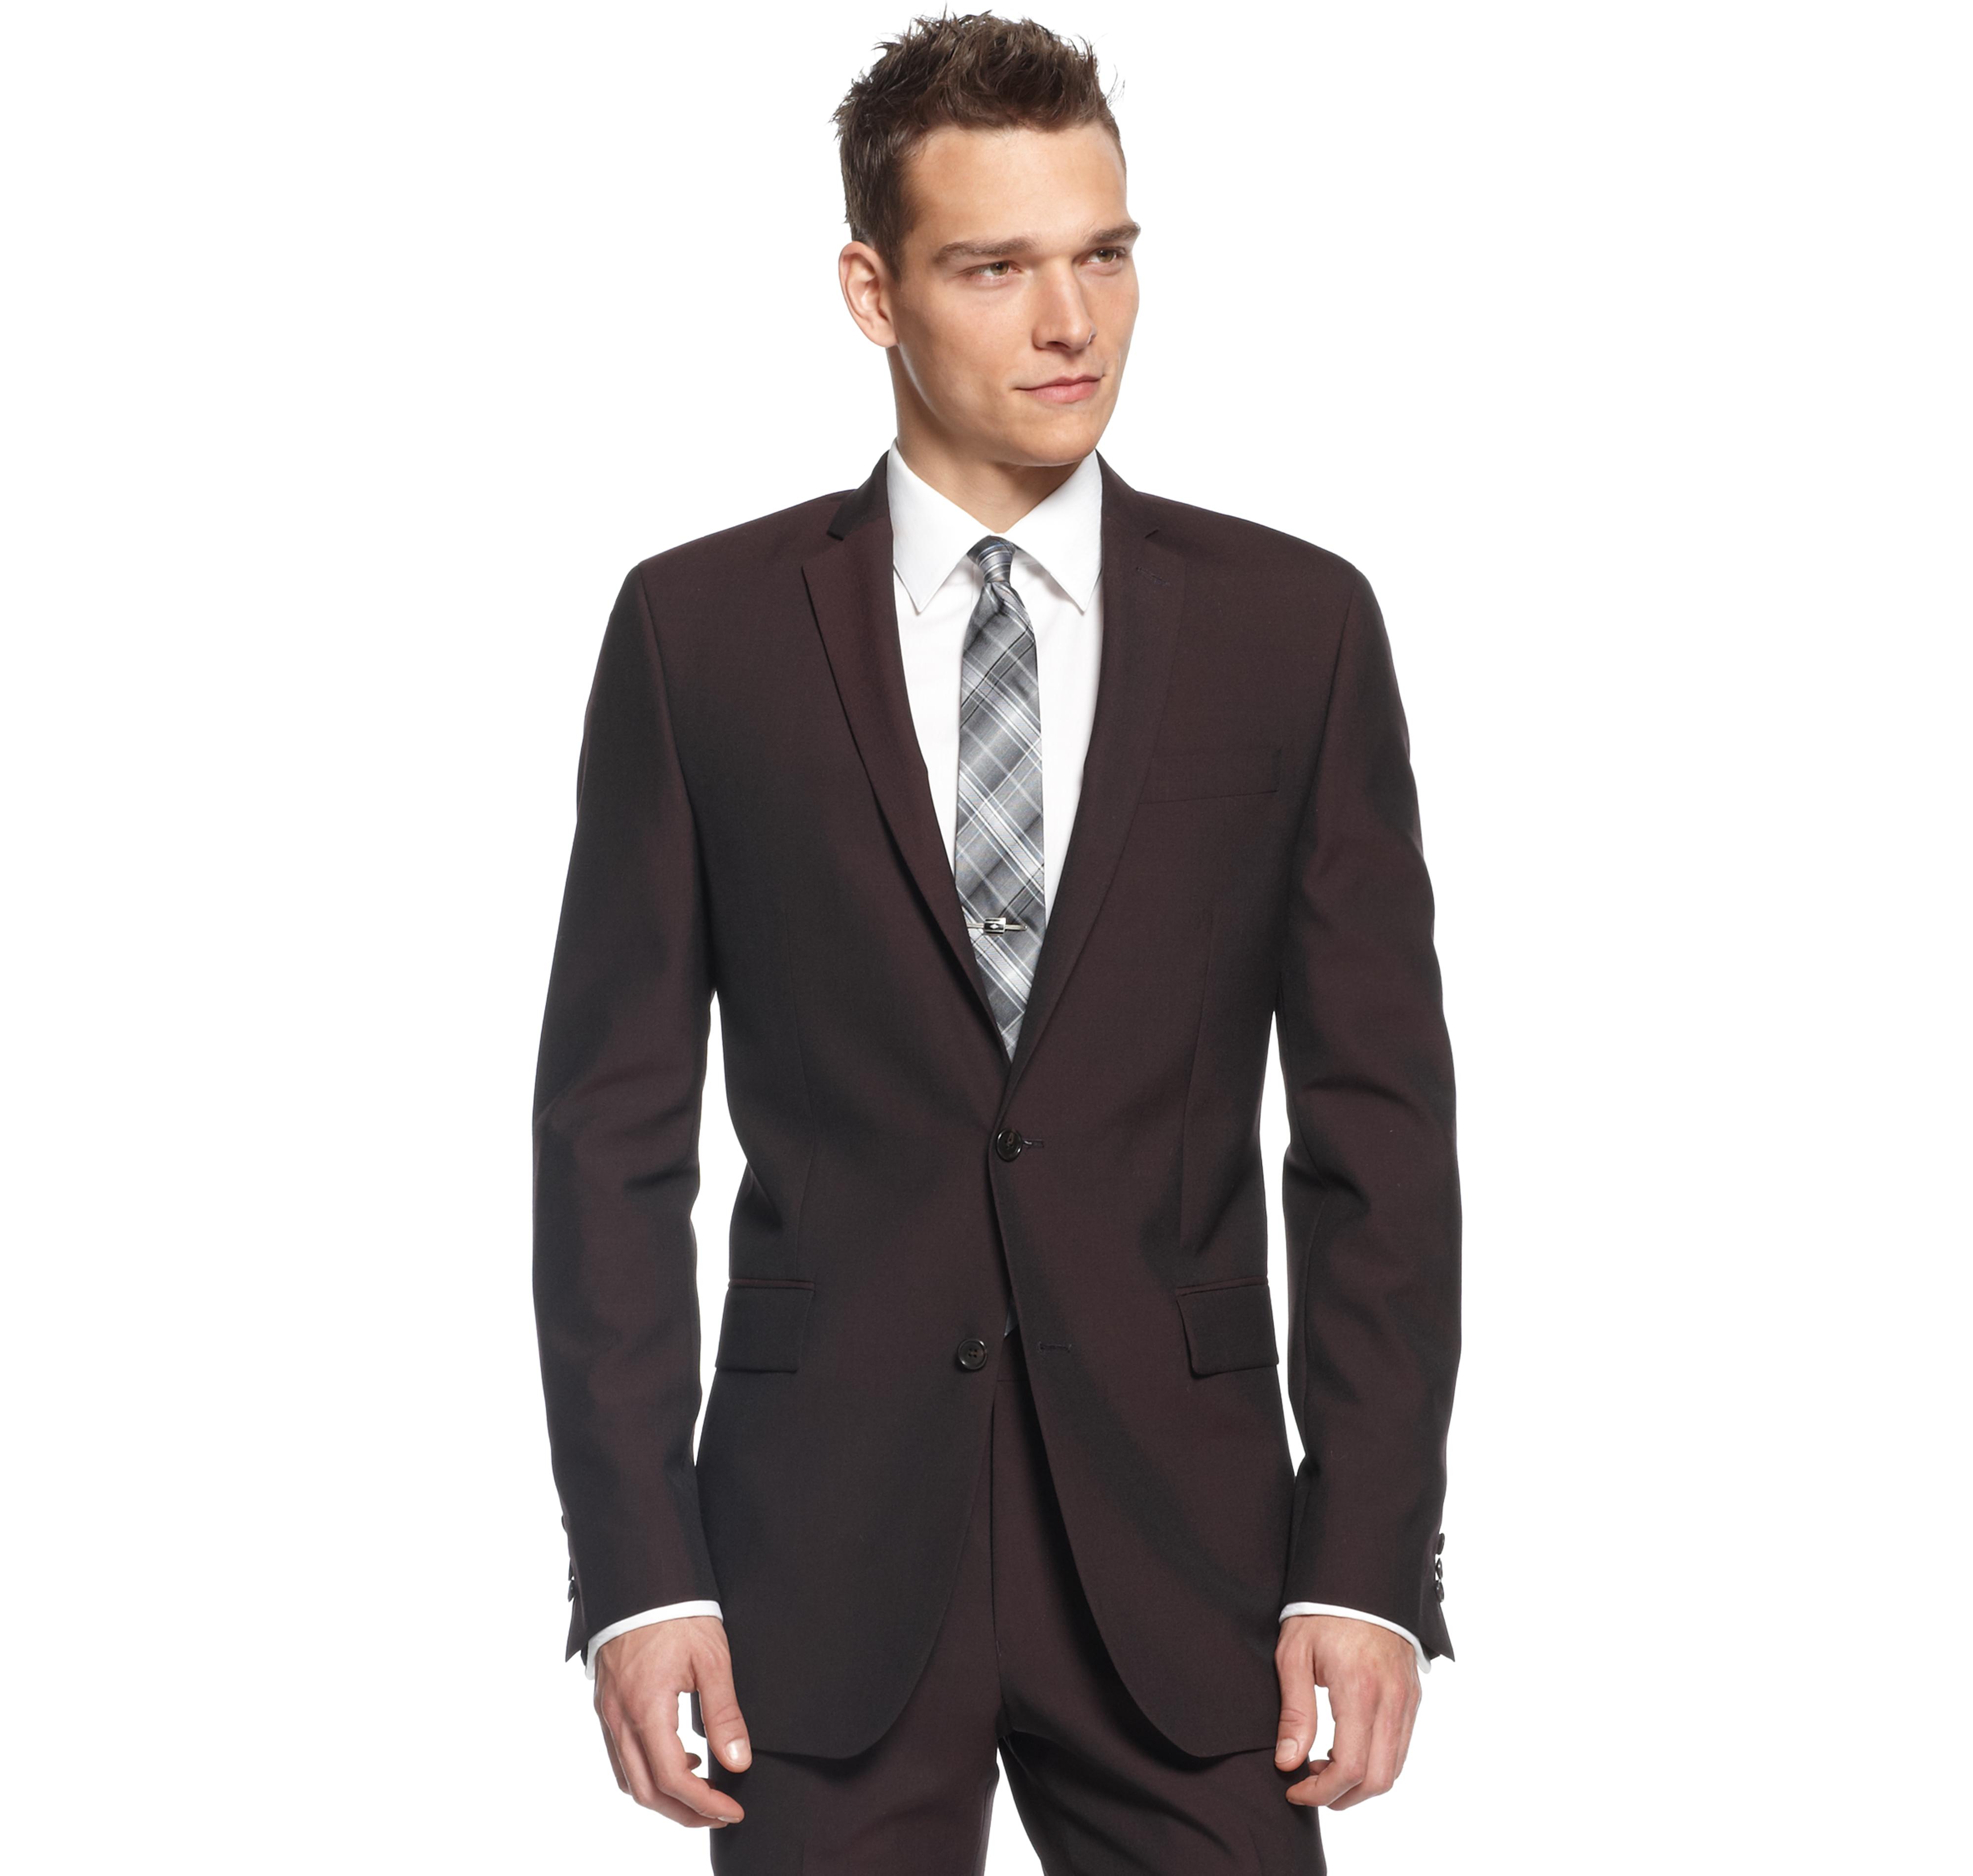 Americanas Para Hombre · Trajes Para Hombre · Calvin Klein X Burgundy Solid  Slim-Fit Jacket Moda Masculina 009548b7d40